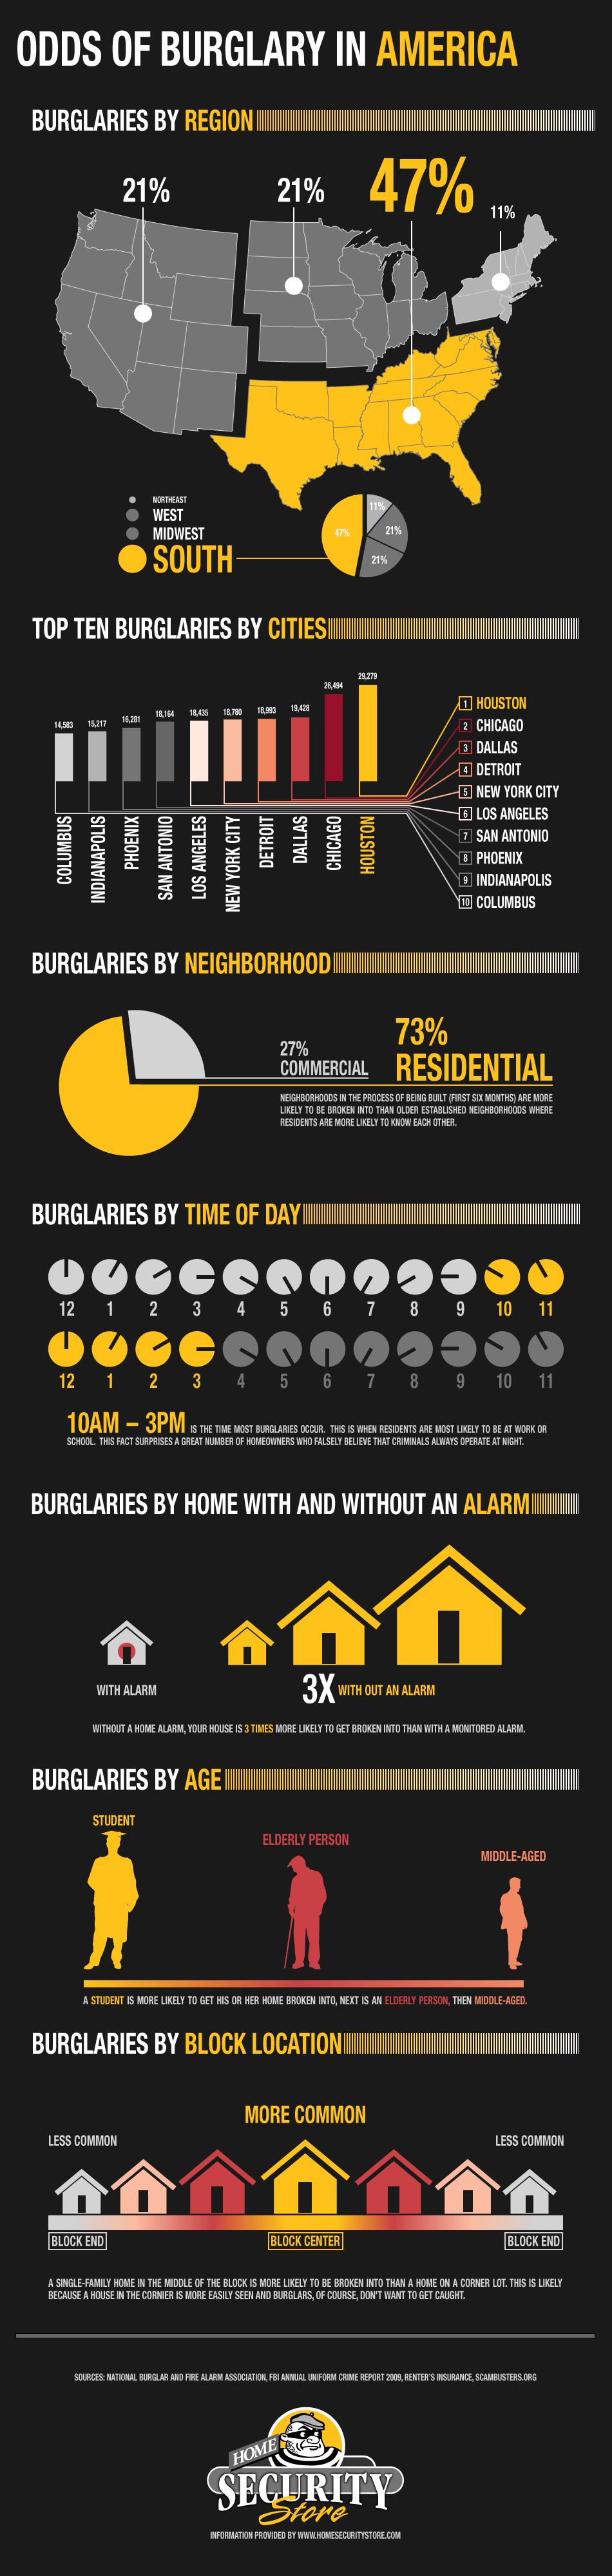 Odds-Of-Burglary-In-America-infographic